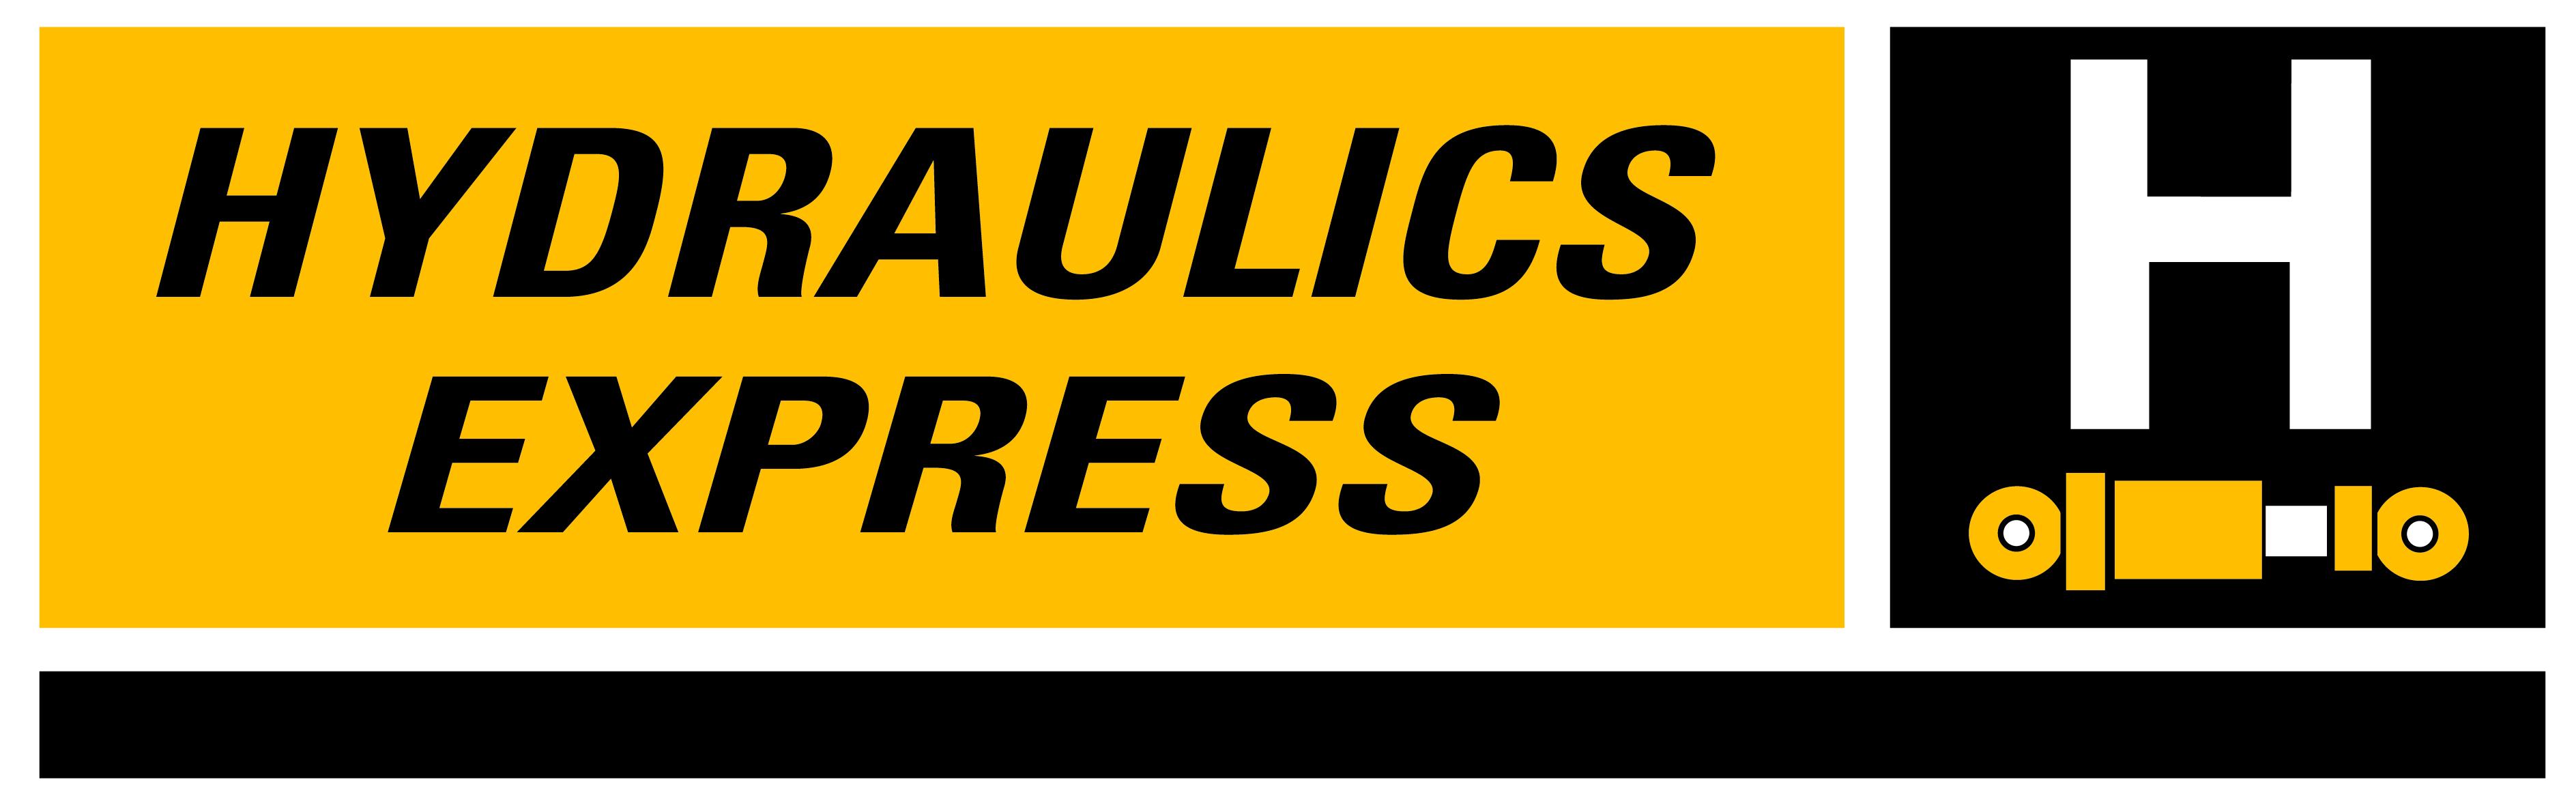 Hydraulics Express Logo